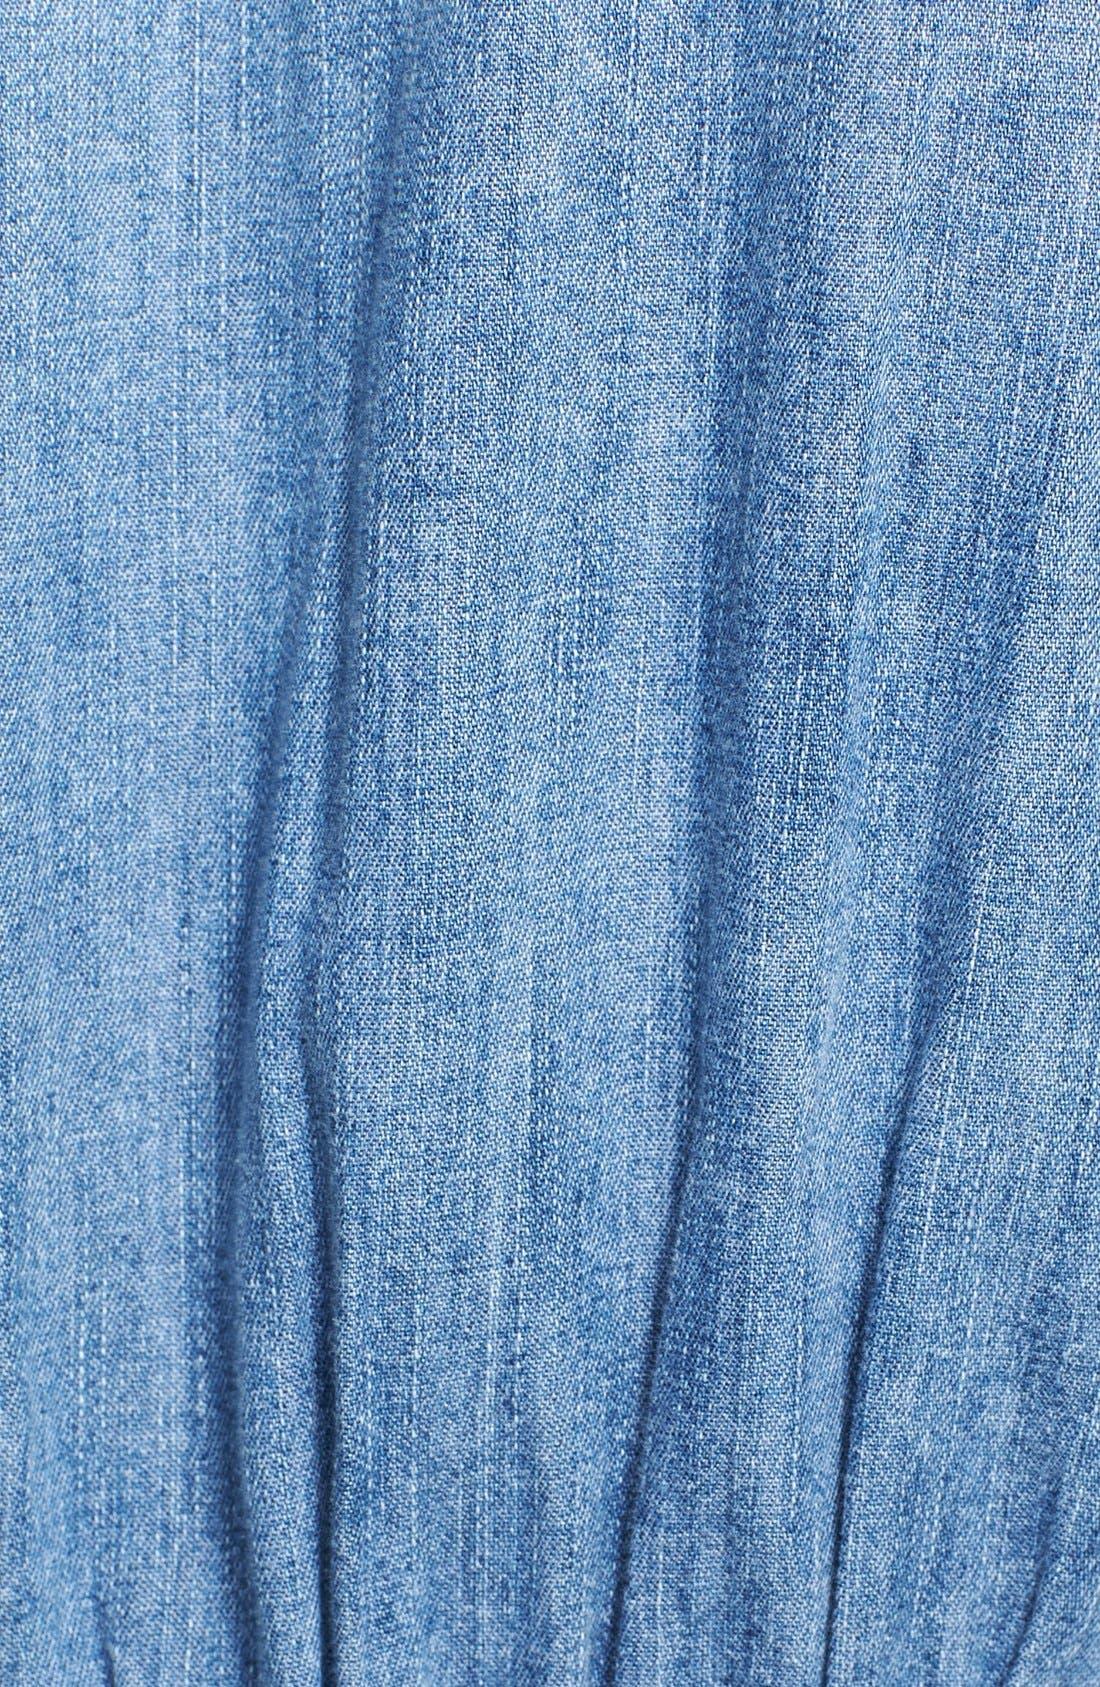 Alternate Image 3  - Current/Elliott 'The Prep School' Denim Shirtdress